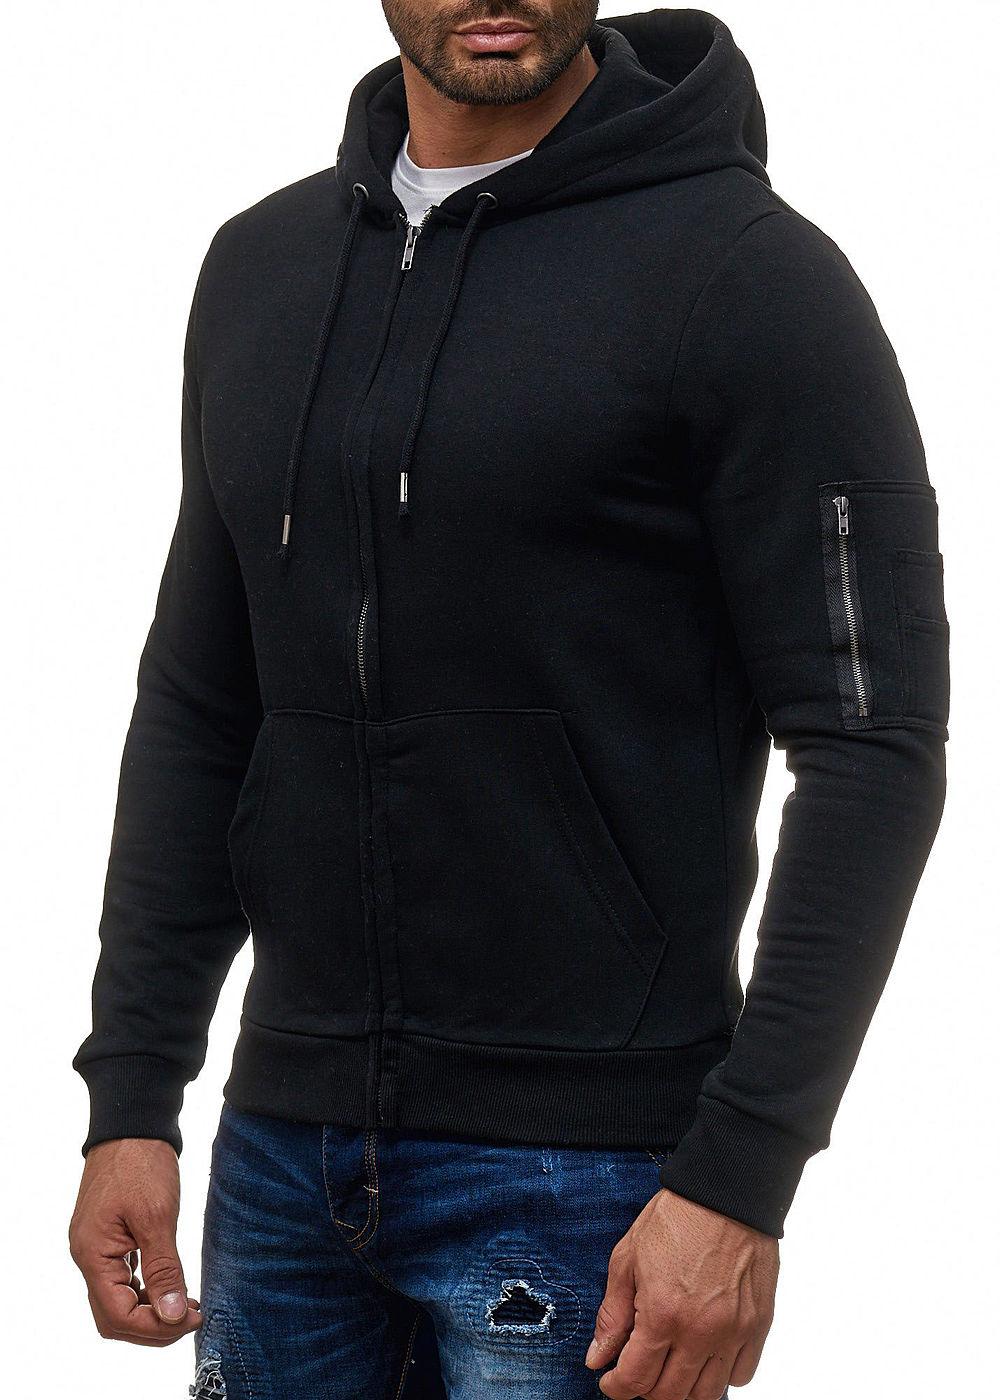 seventyseven lifestyle herren zip hoodie kapuze 2 taschen kordelzug schwarz 77onlineshop. Black Bedroom Furniture Sets. Home Design Ideas